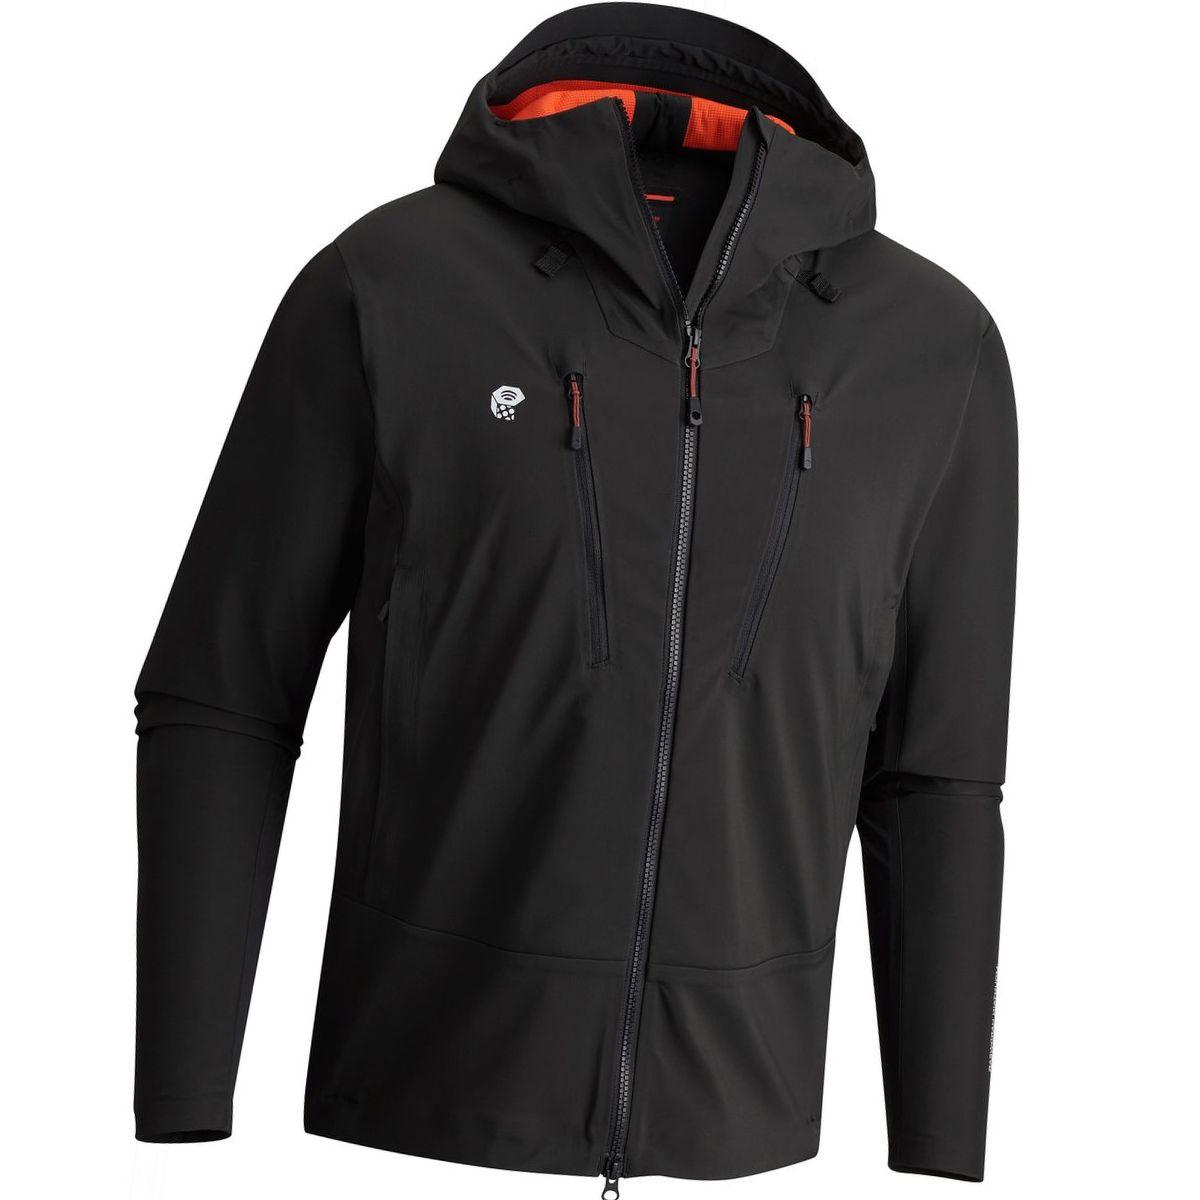 Mountain Hardwear Touren Hooded Jacket - Men's